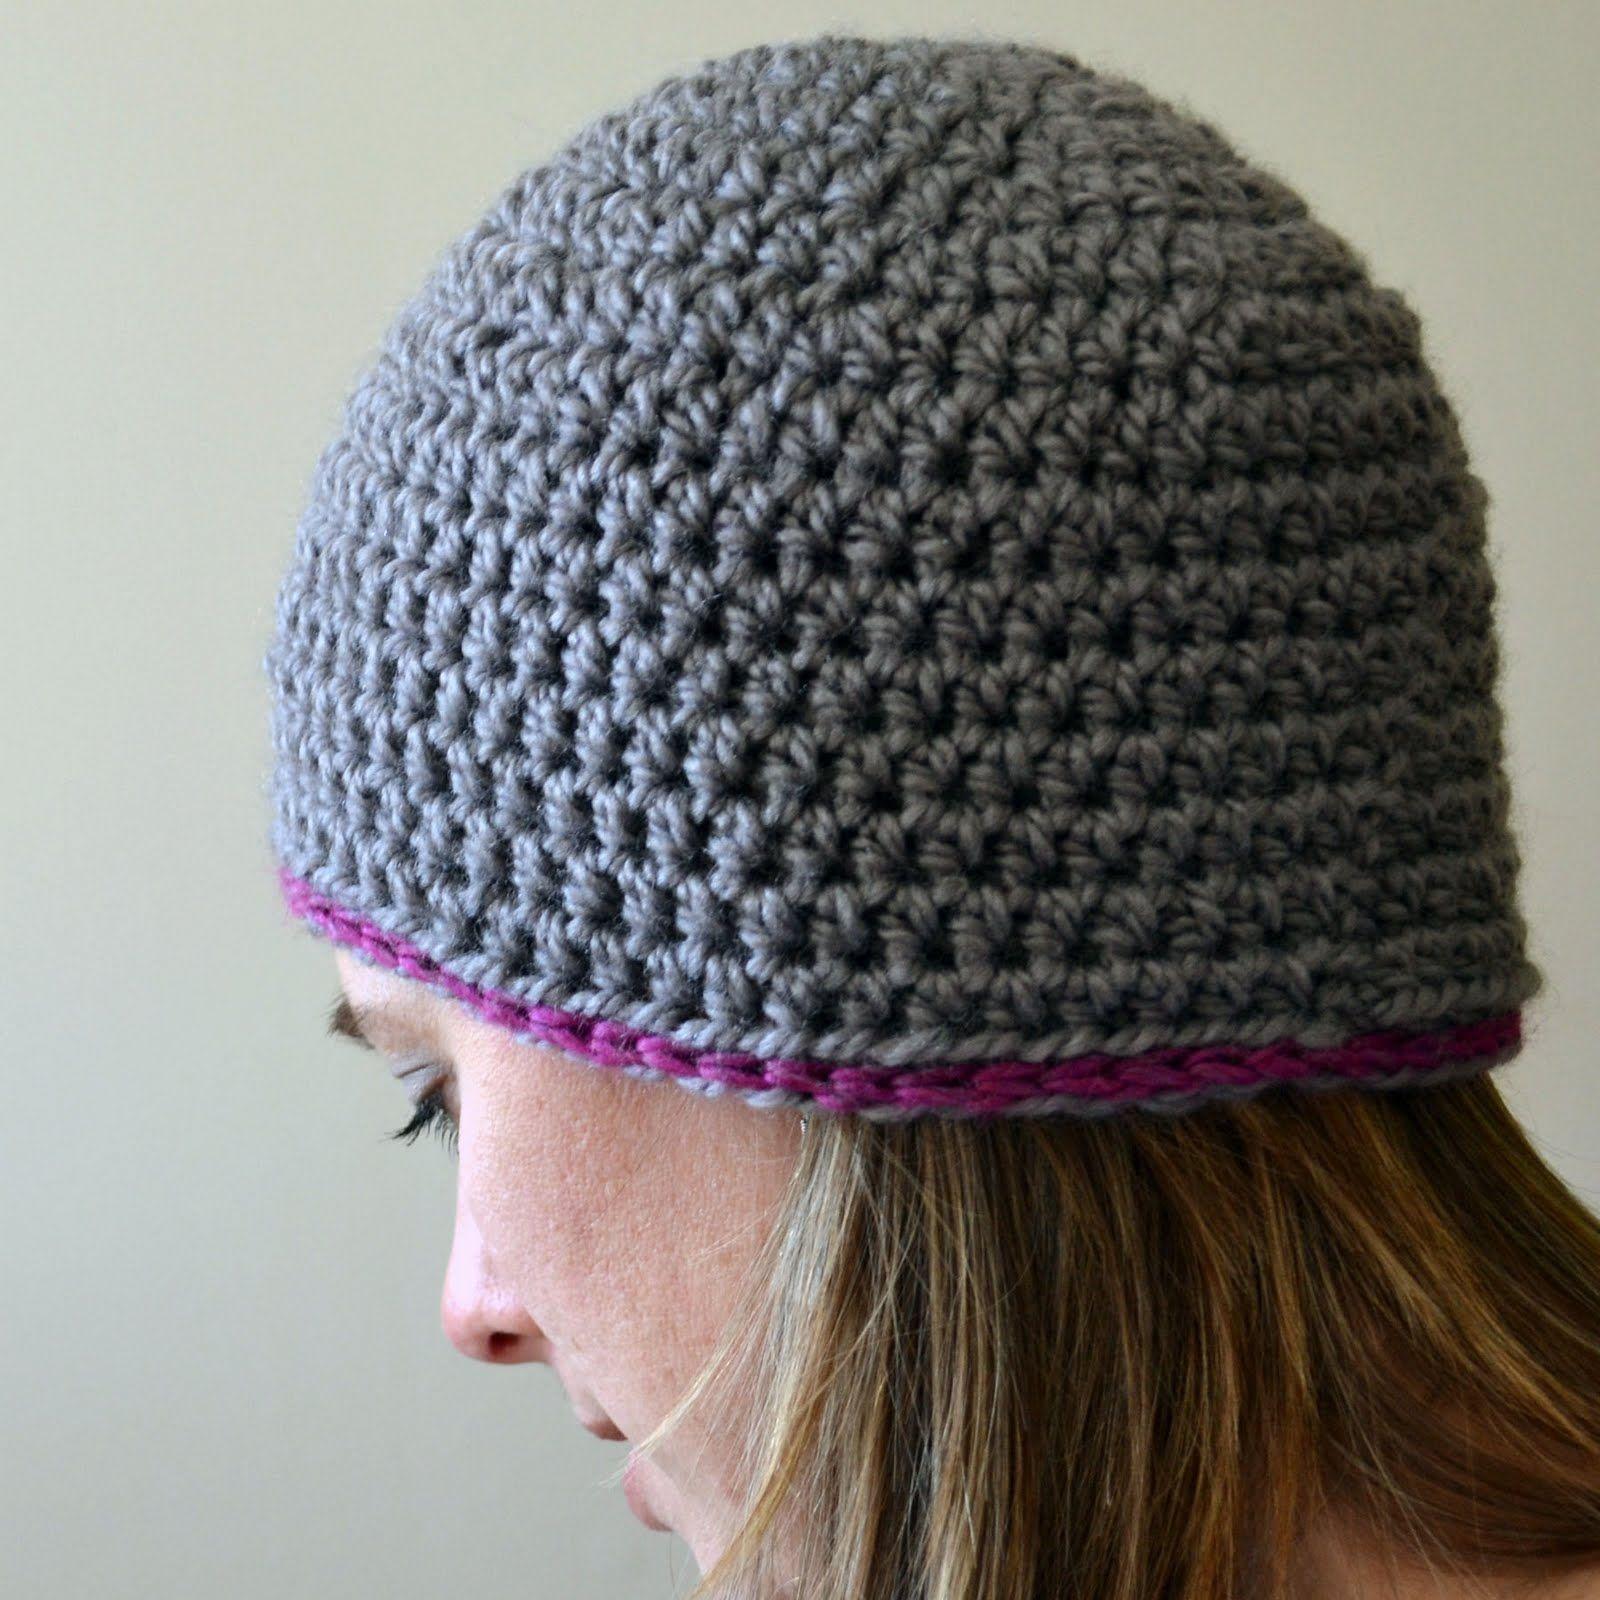 Cute Beanie No Knot Finishing Method For Crochet